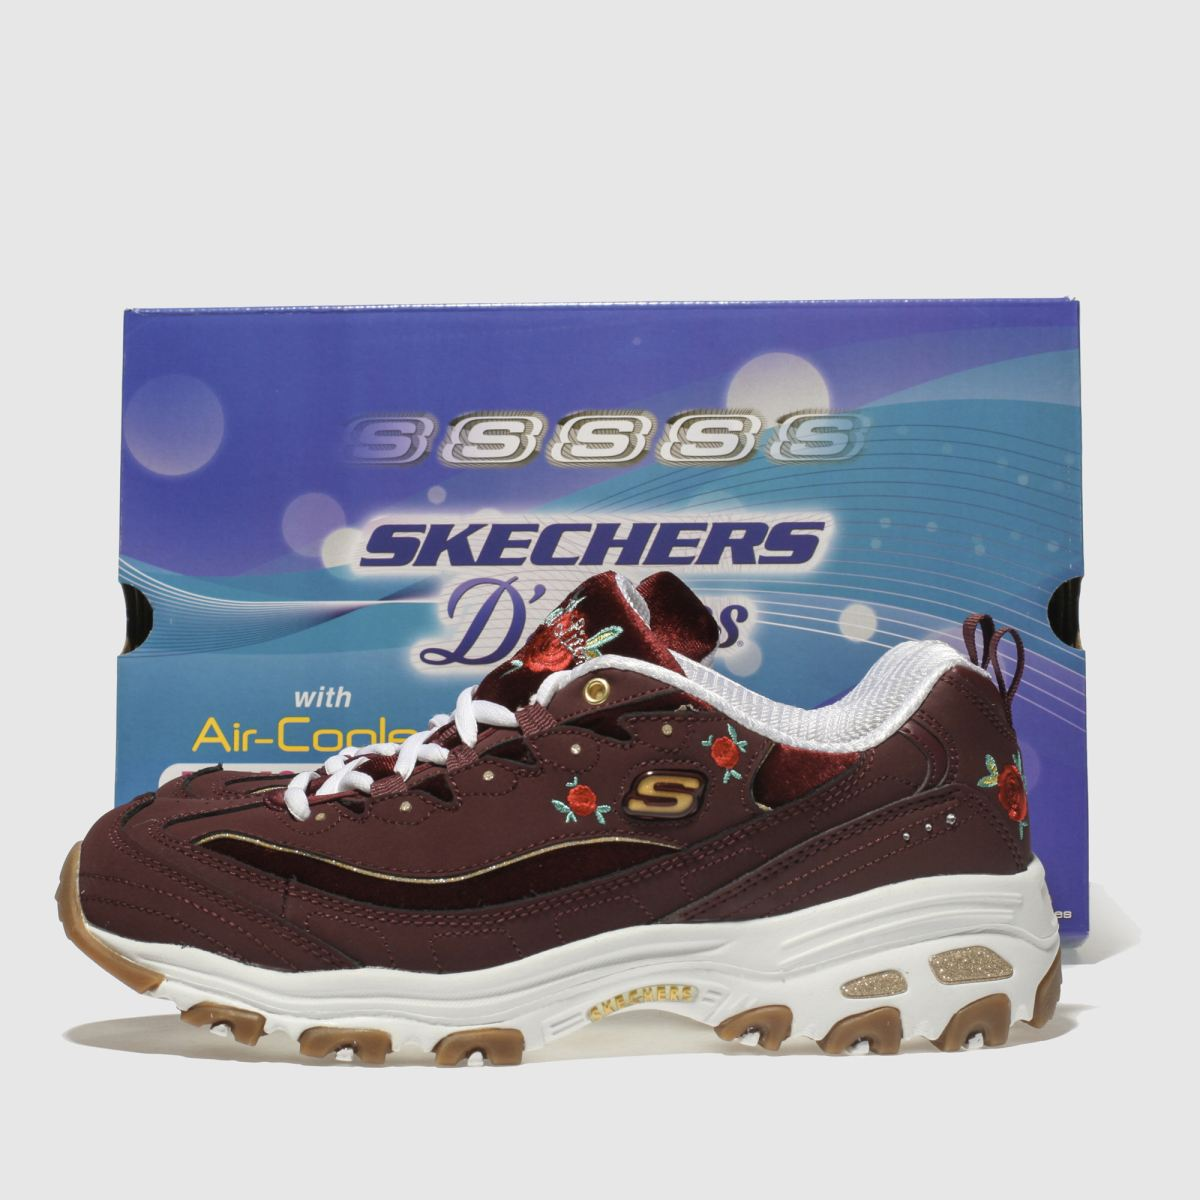 Damen Weinrot skechers Dlites Sneaker | Schuhe schuh Gute Qualität beliebte Schuhe | 1b27c5